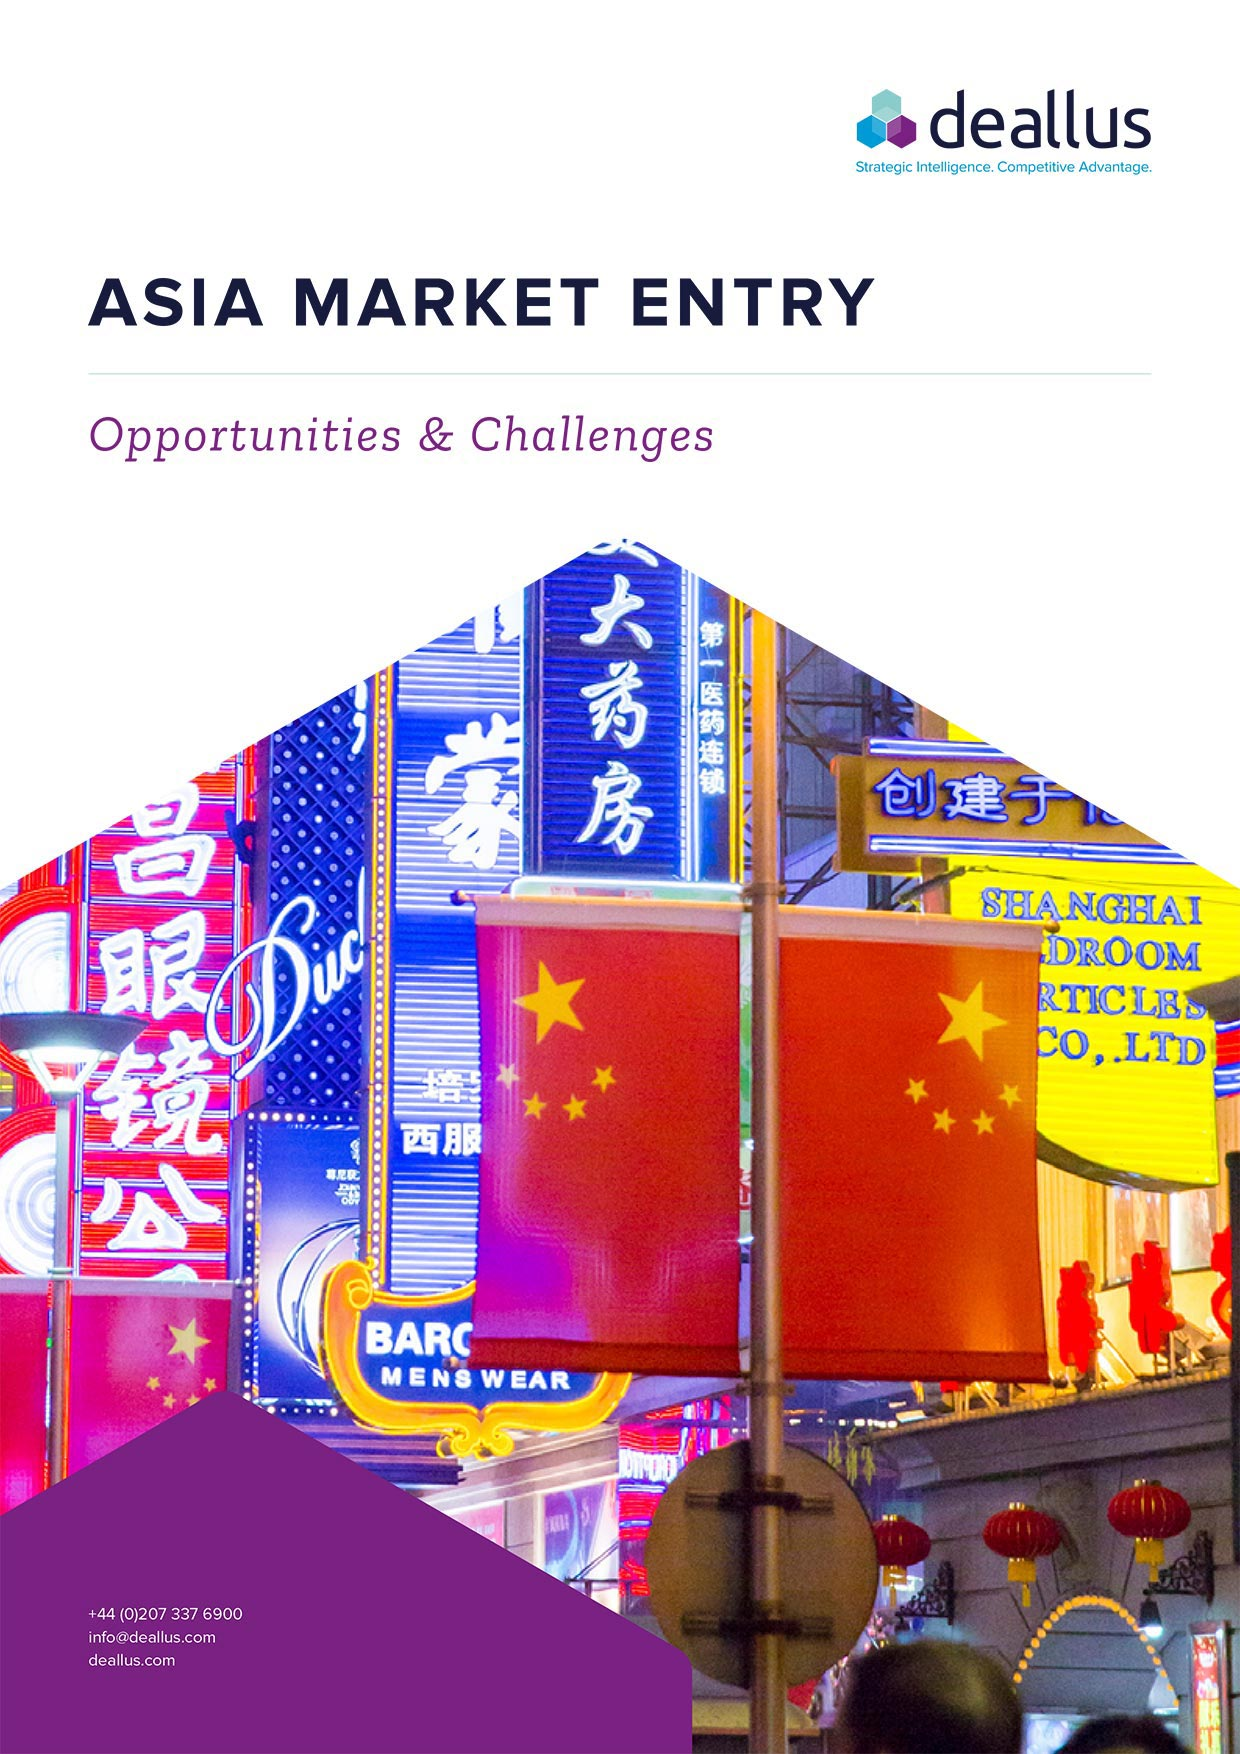 Deallus Asia Market Entry Whitepaper